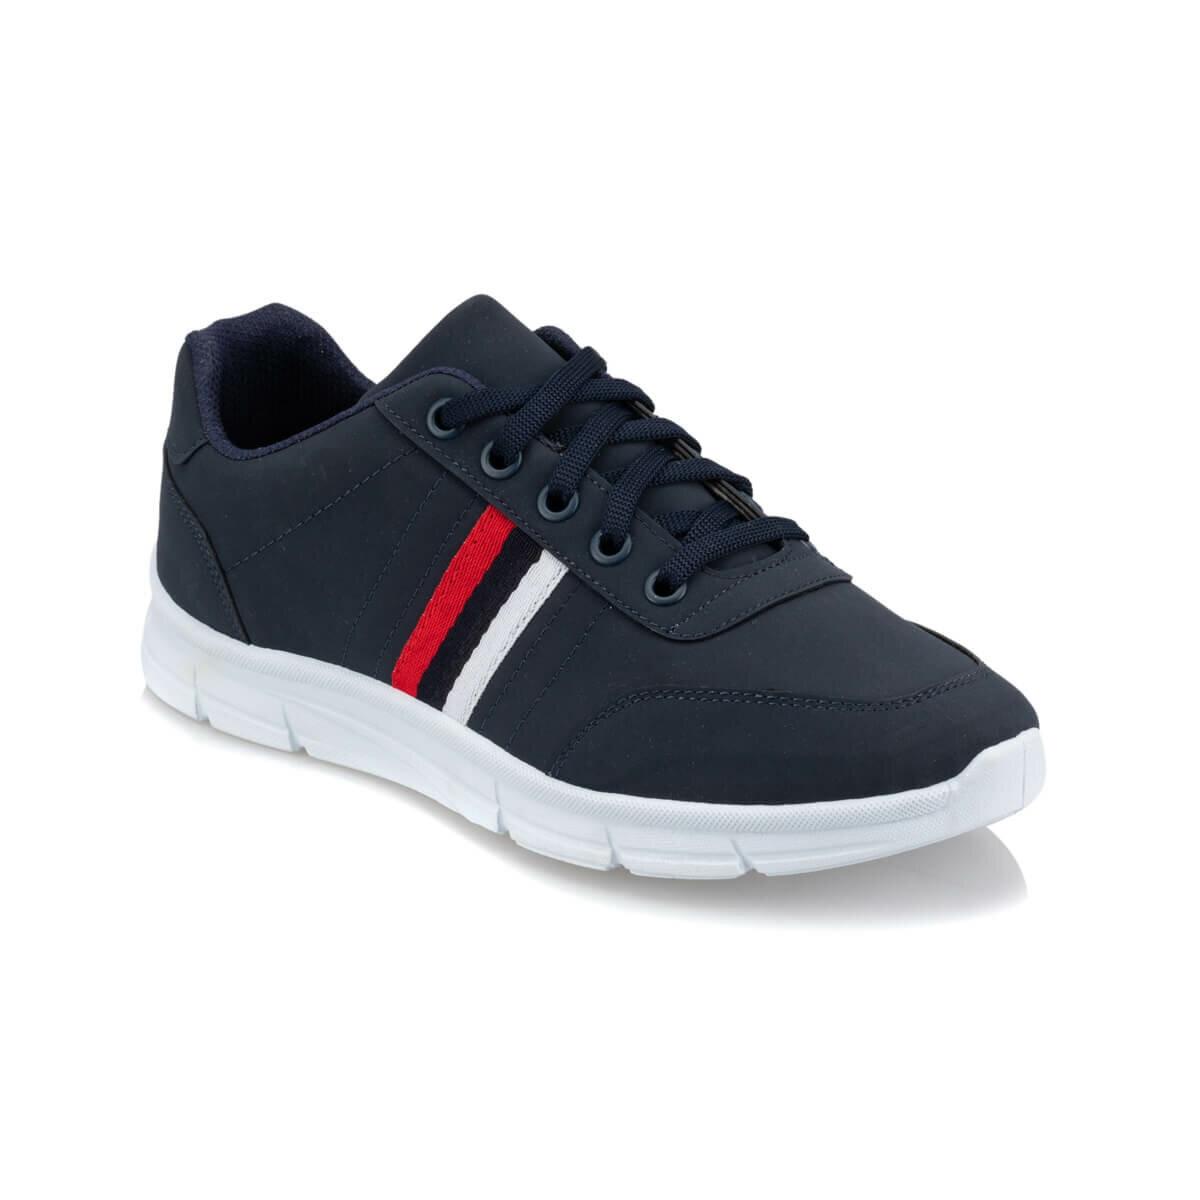 FLO 92.314872.Z Navy Blue Women 'S Shoes Polaris